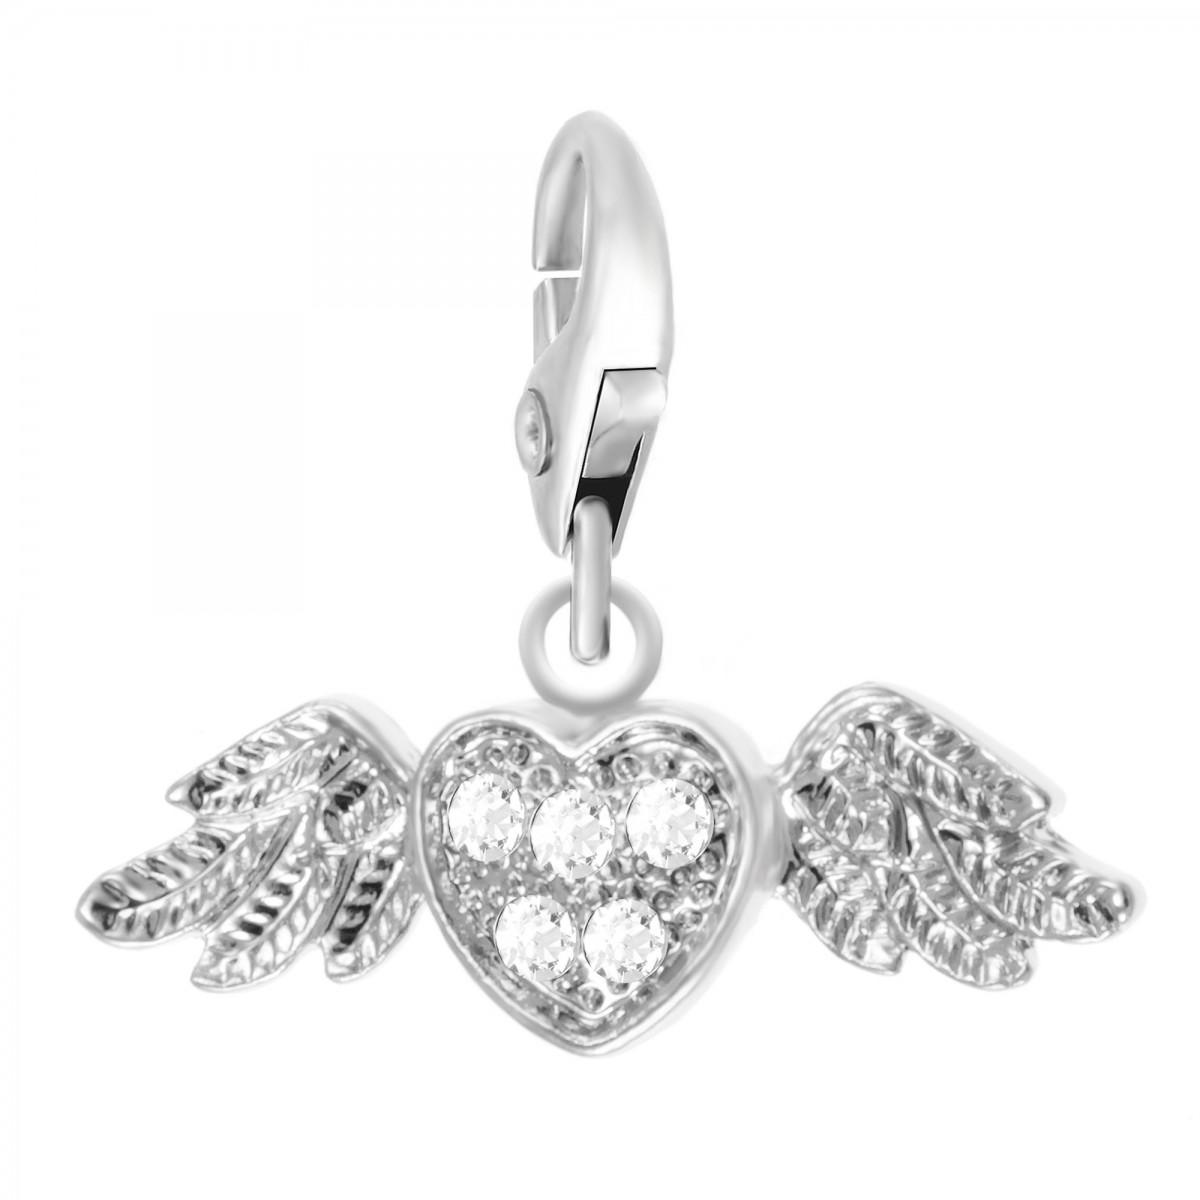 Charm Coeur ailé So Charm made with crystal from Swarovski